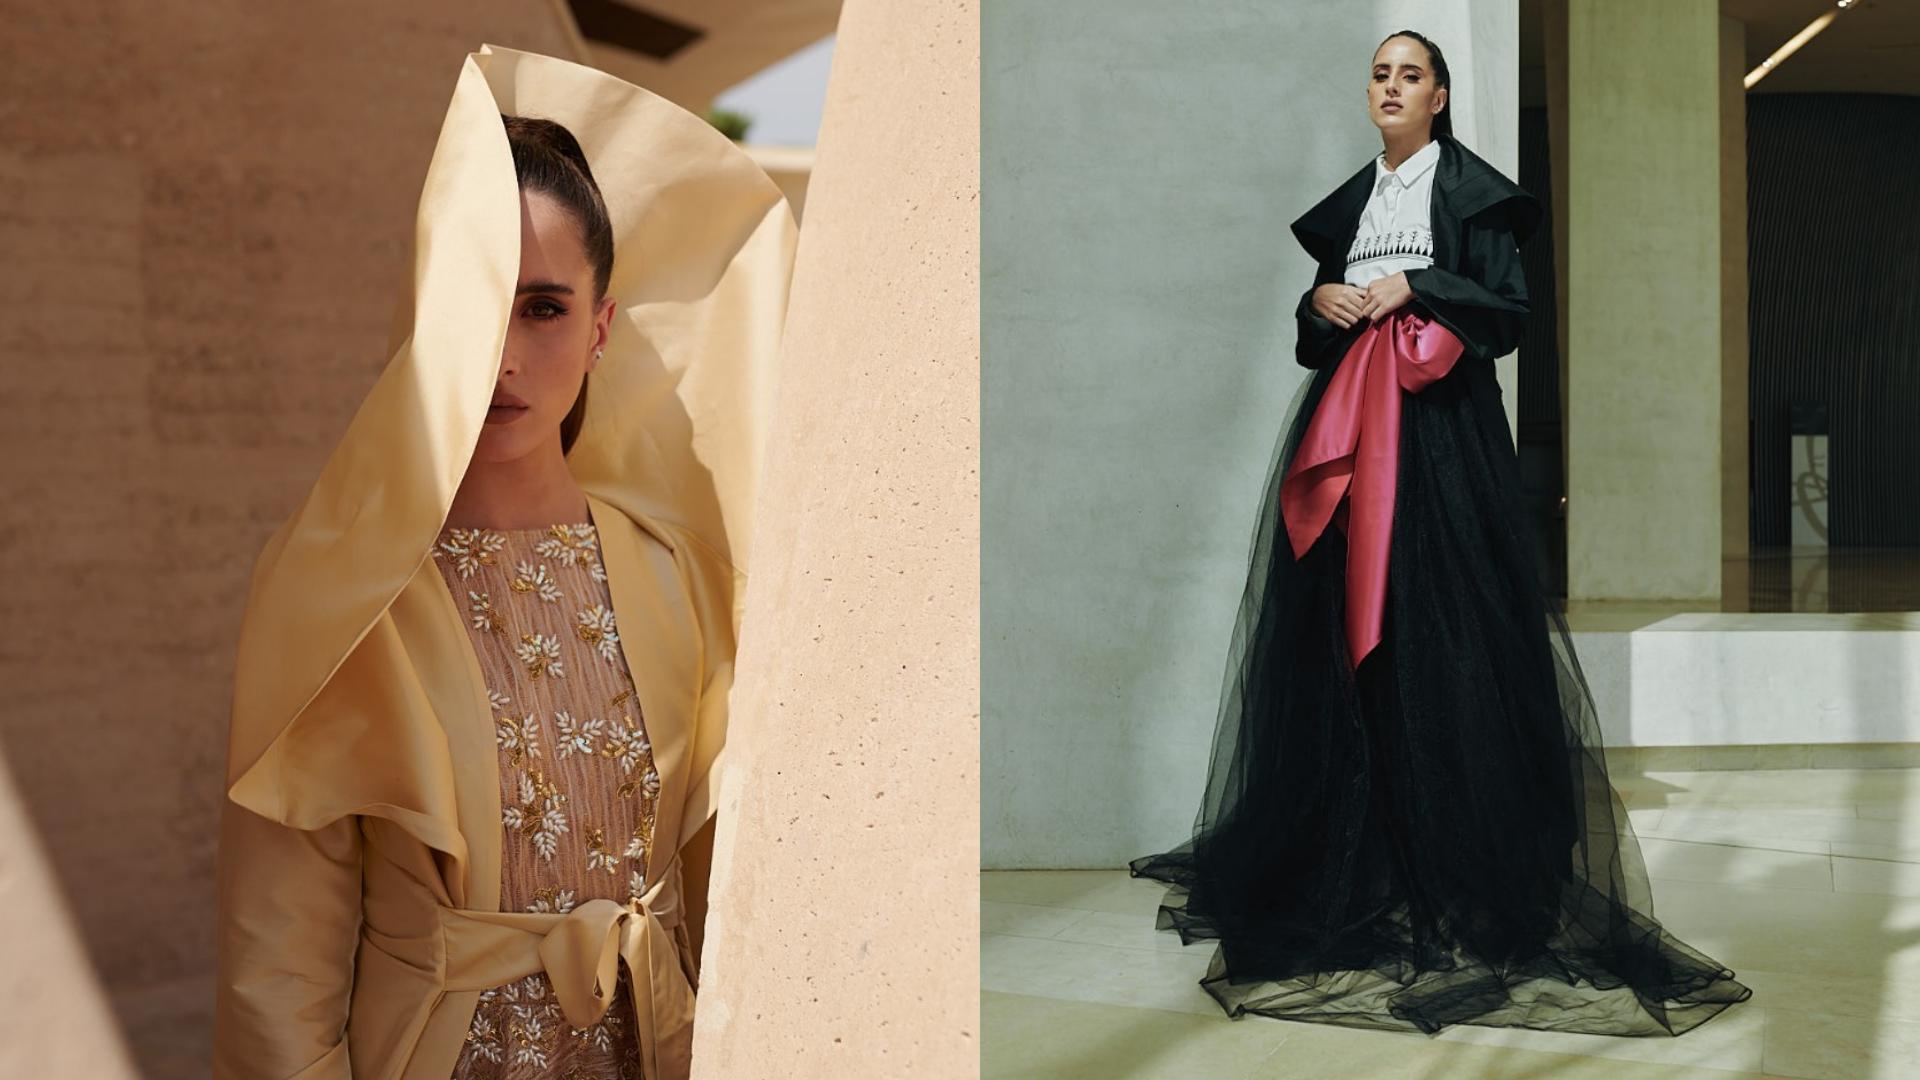 Taleedah Tamer Is The Face Of The Tanween Fashion Exhibit At Ithra's 'Creativity Season' In Saudi Arabia